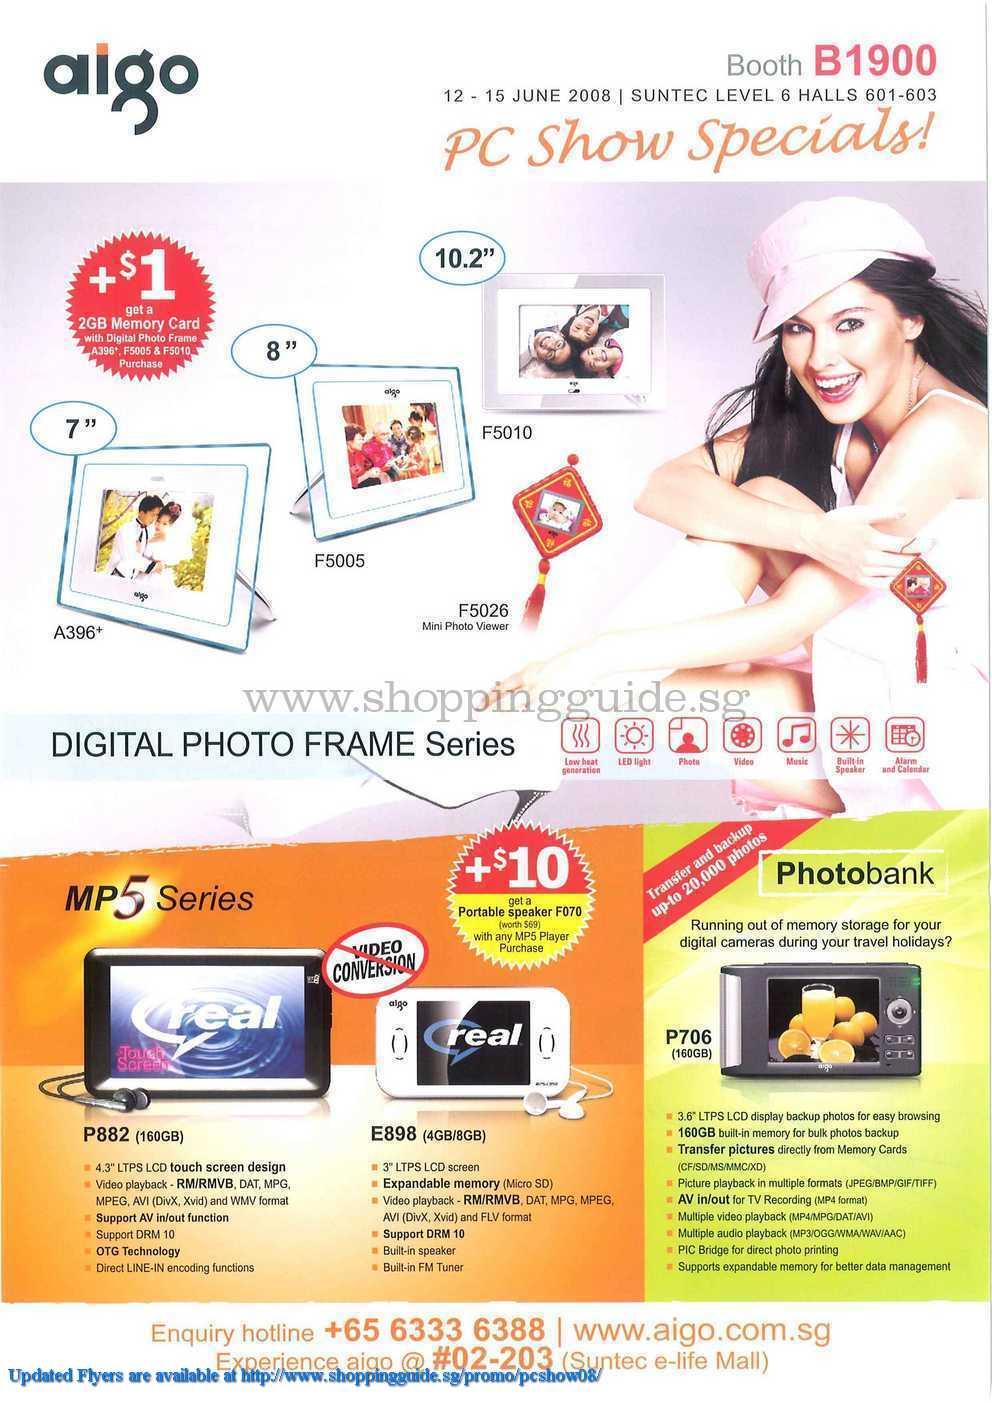 PC Show 2008 price list image brochure of Aigo ShoppingGuide.SG-PcShow08-018